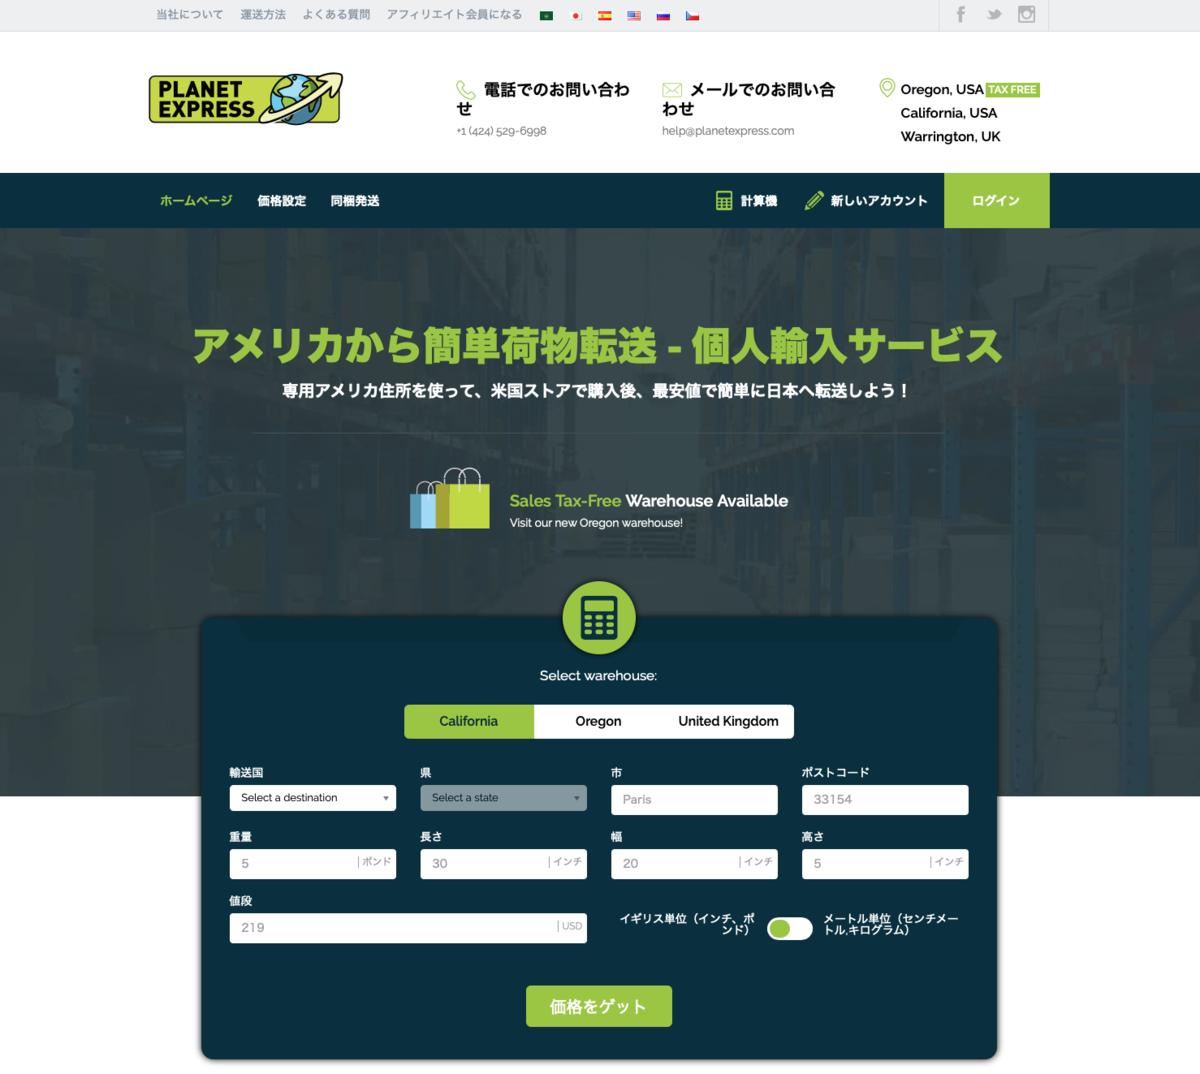 f:id:jwatanabe:20200924142554p:plain